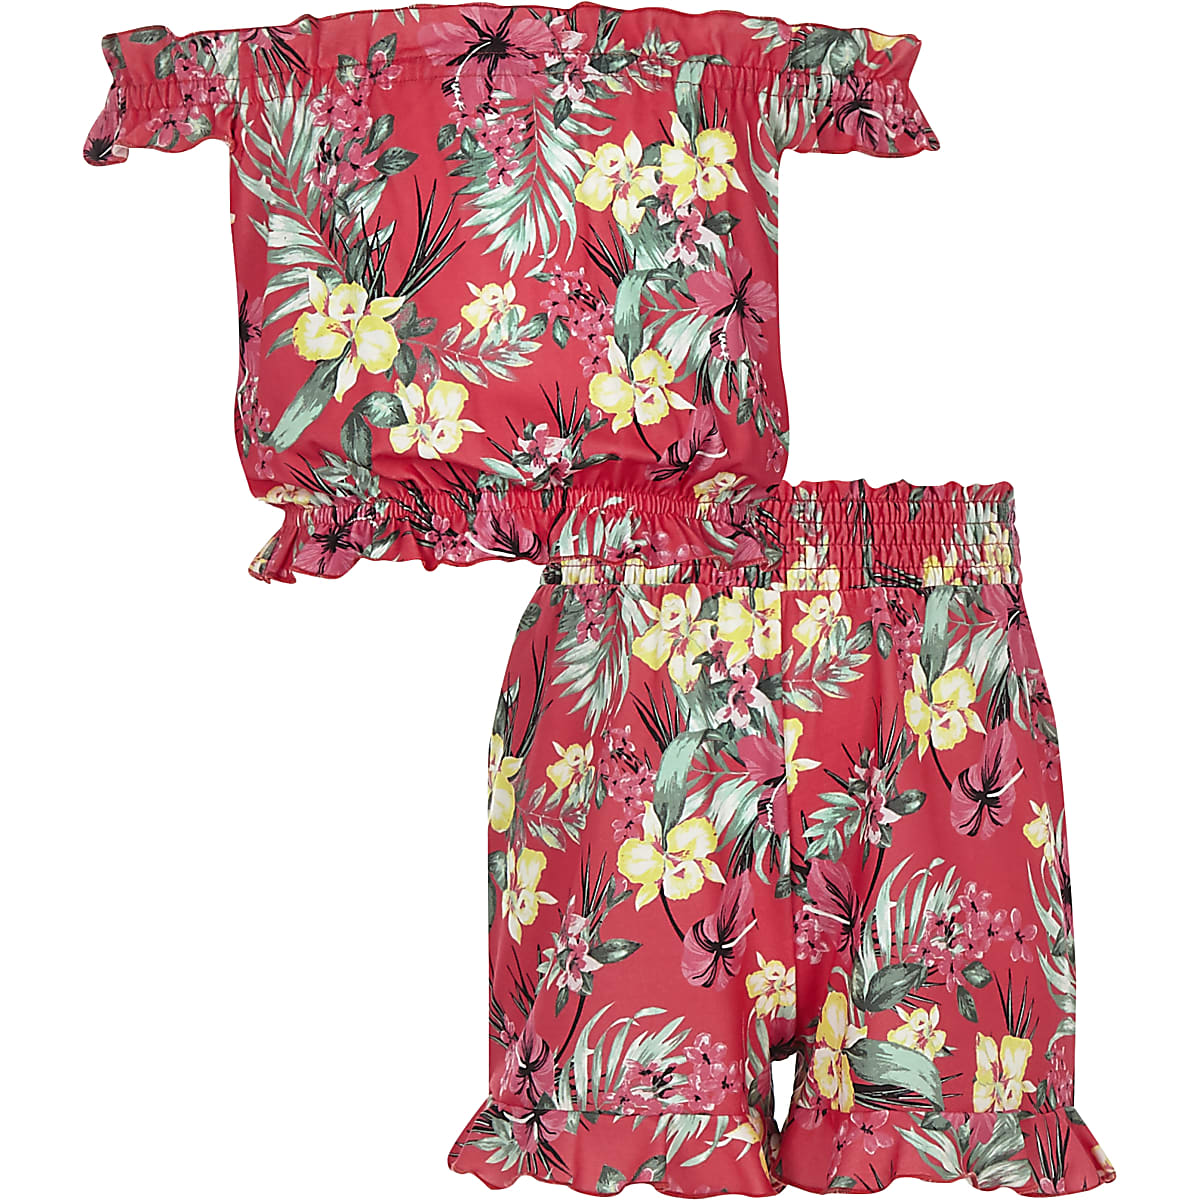 Girls pink floral print bardot top outfit